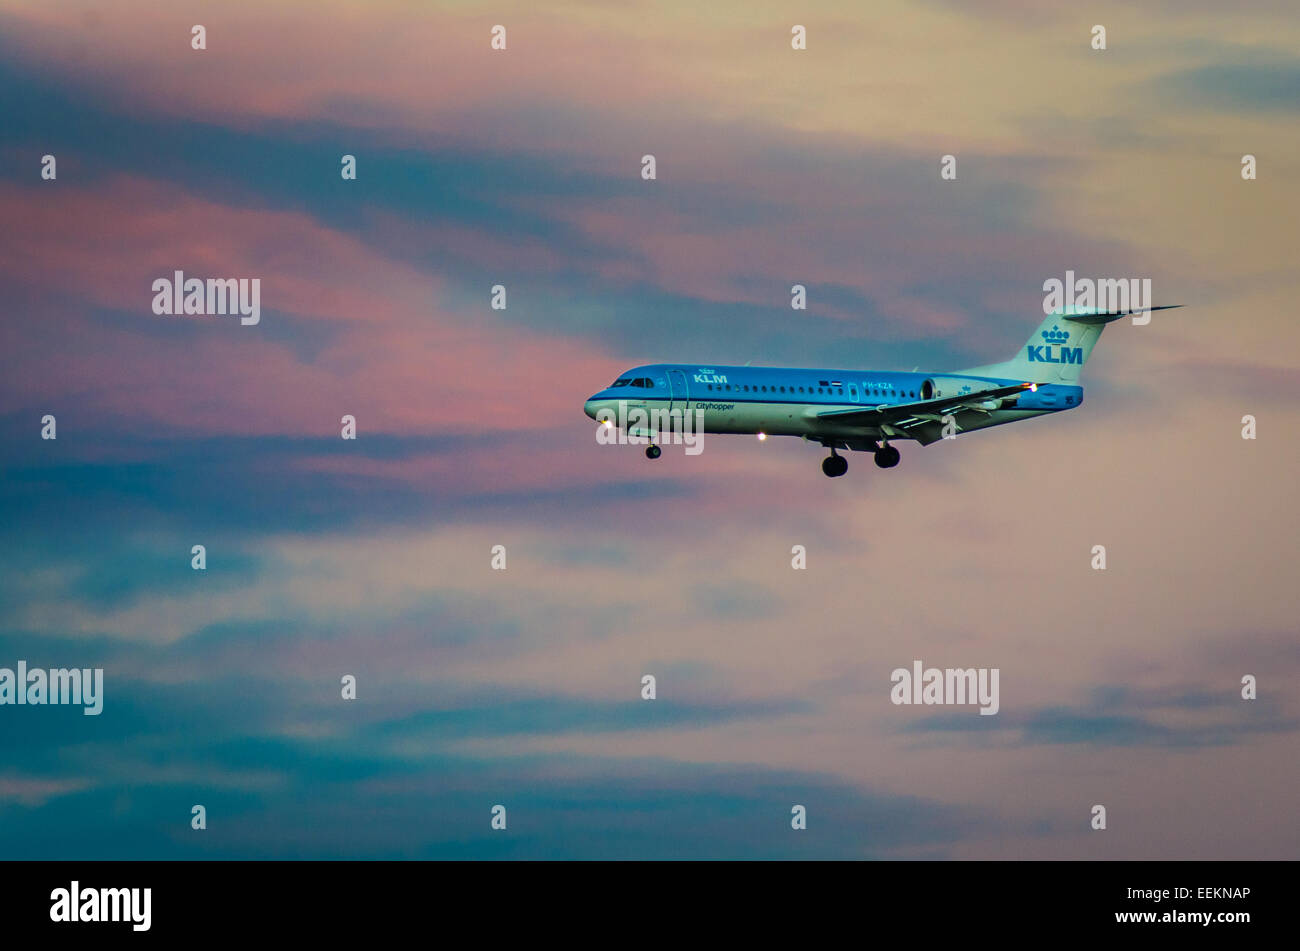 A KLM royal dutch airlines Koninklijke Luchtvaart Maatschappij coming in to land at Cardiff Airport - Stock Image